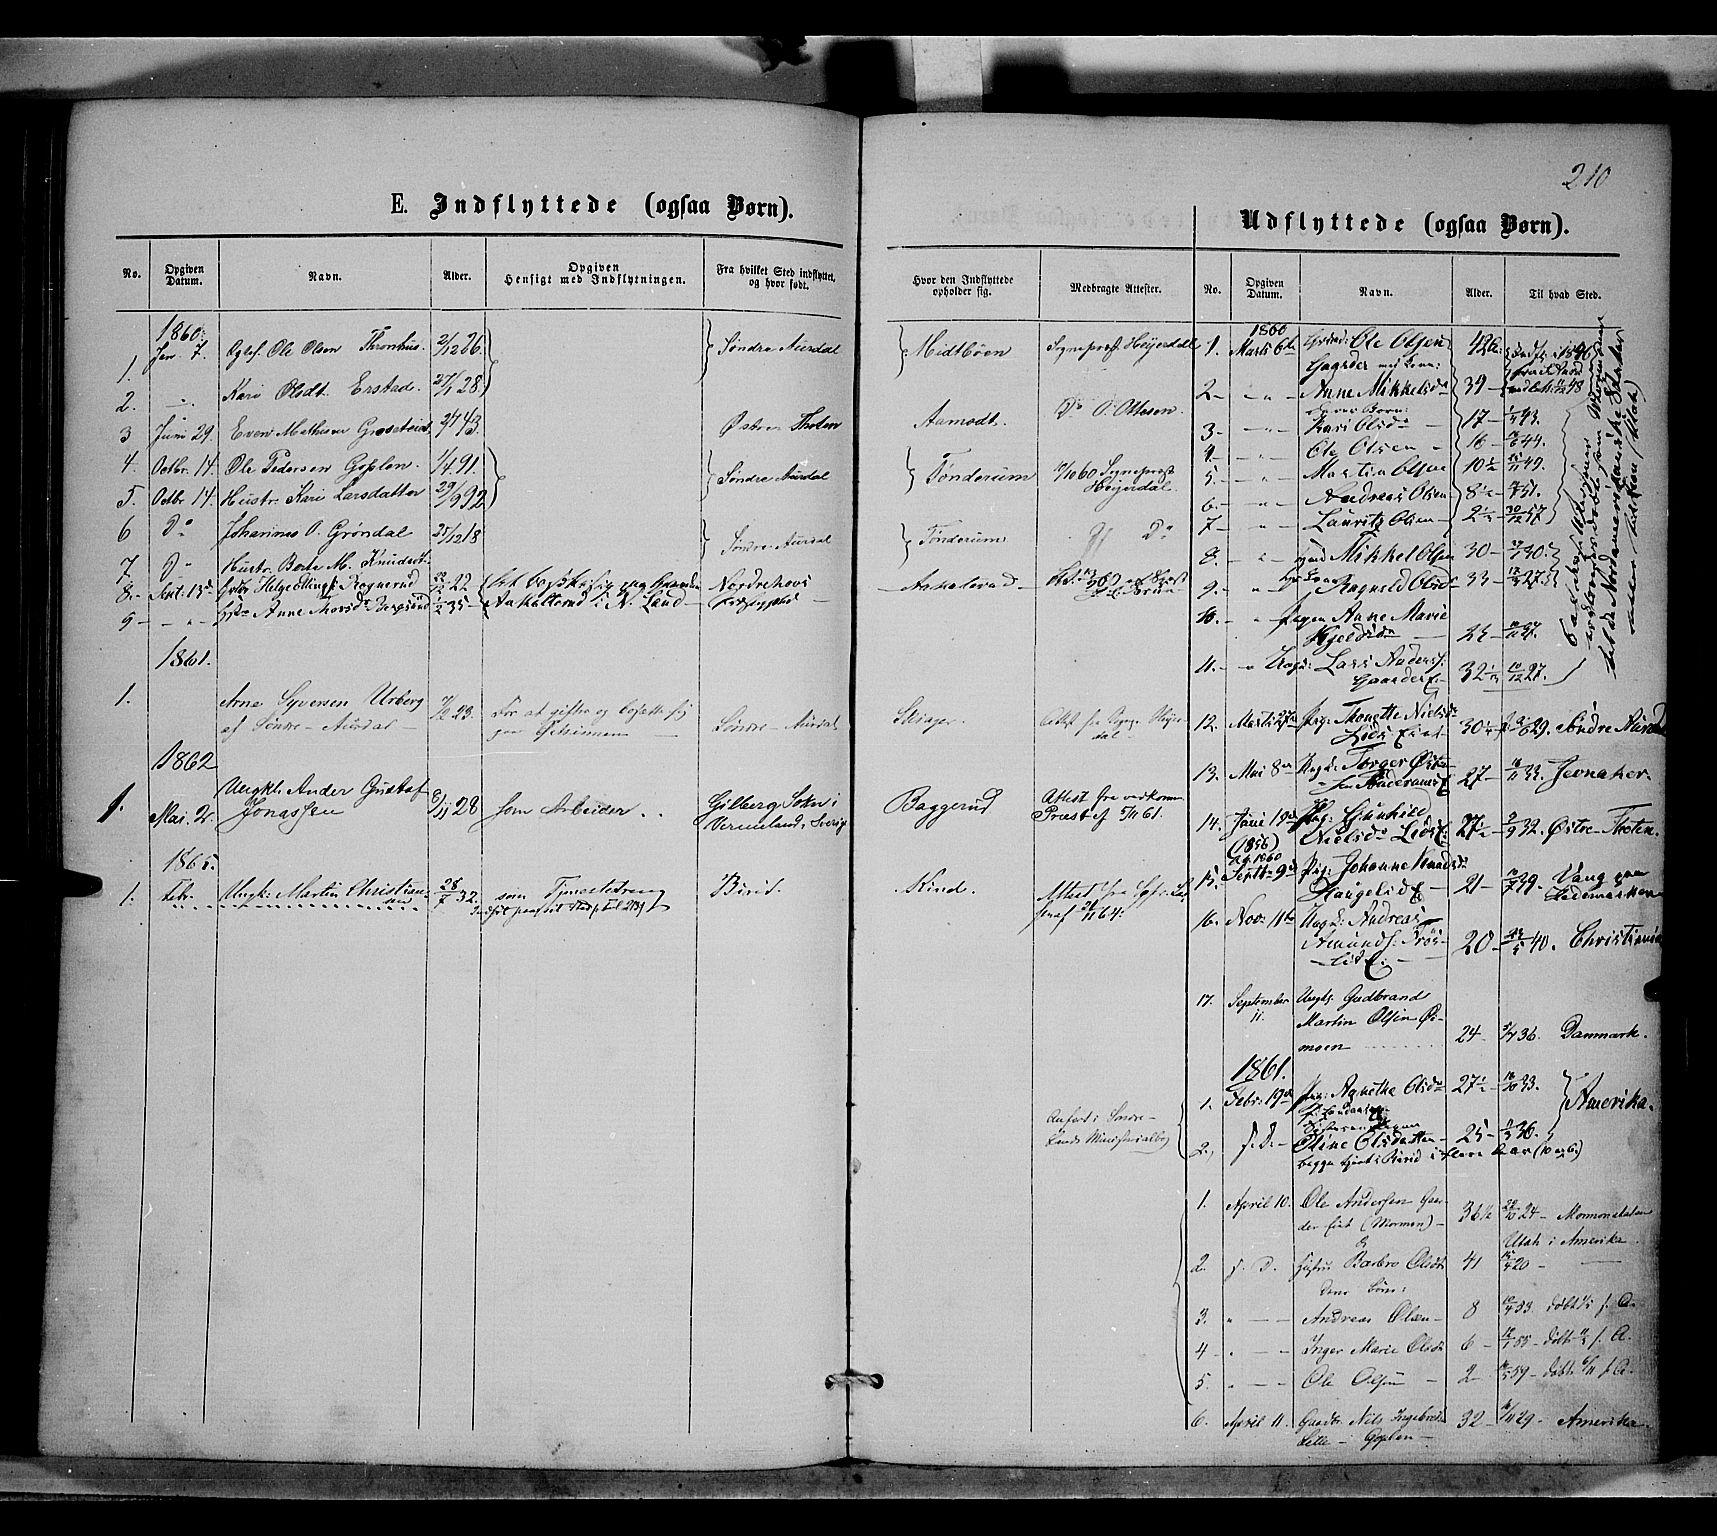 SAH, Nordre Land prestekontor, Ministerialbok nr. 1, 1860-1871, s. 210